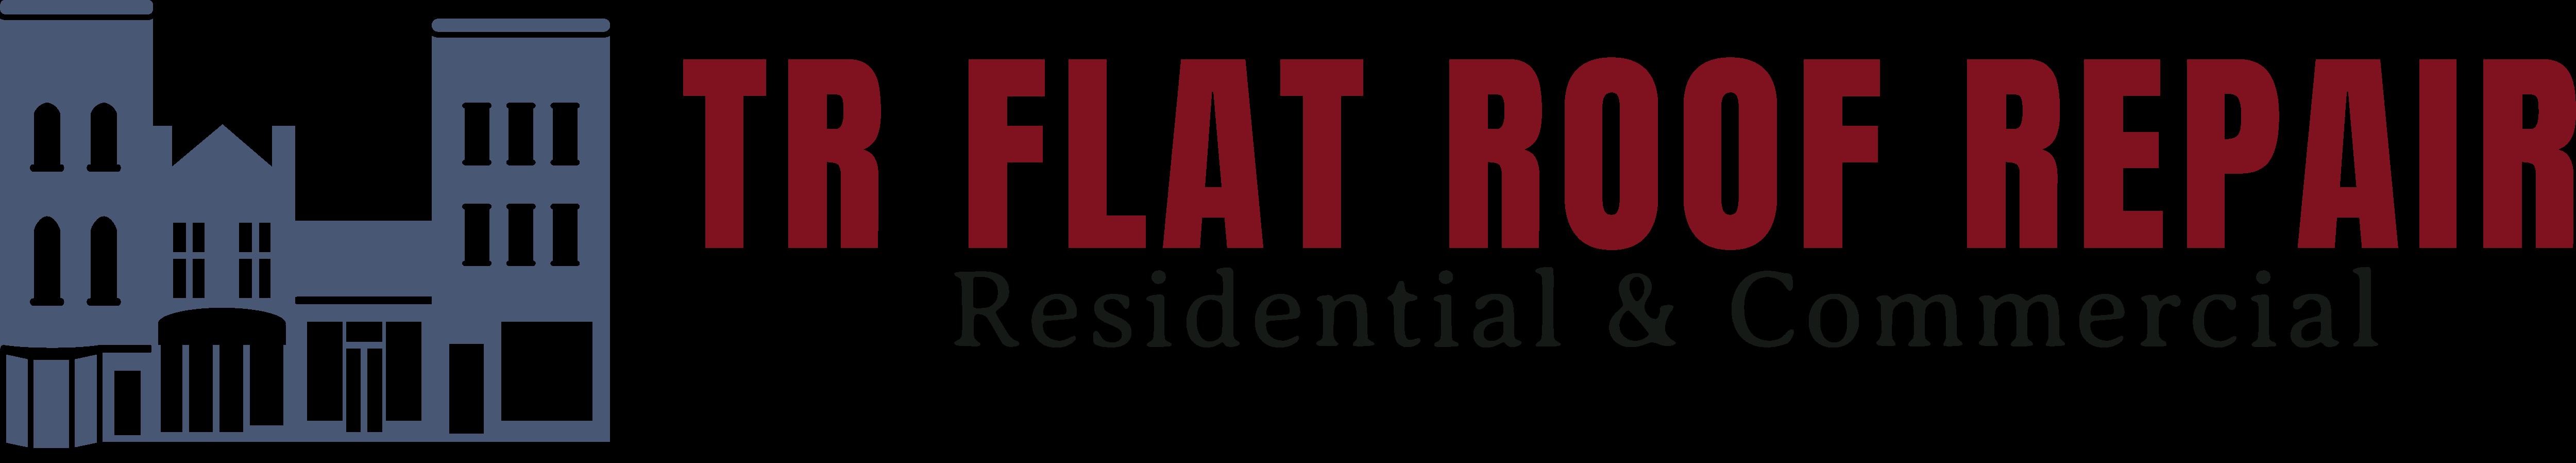 Reviews Roof Repairs Toronto Flat Roofing Toronto 647 870 5122